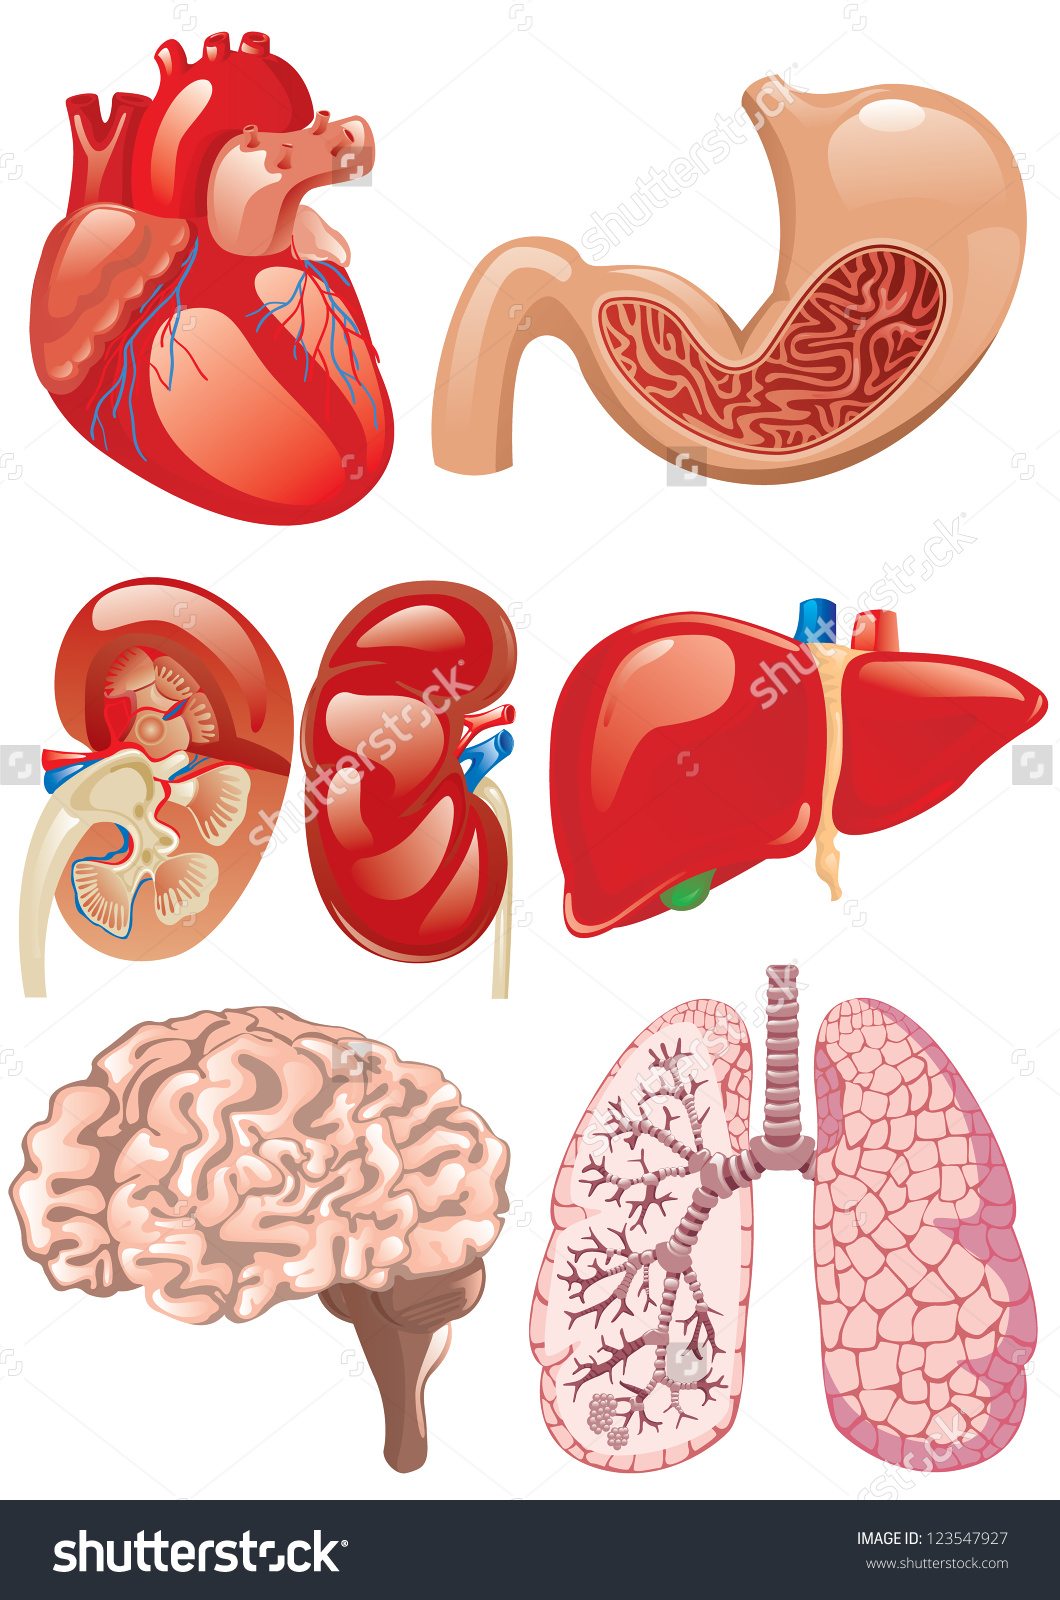 internal brain diagram notifier duct detector wiring human organ clipart - clipground